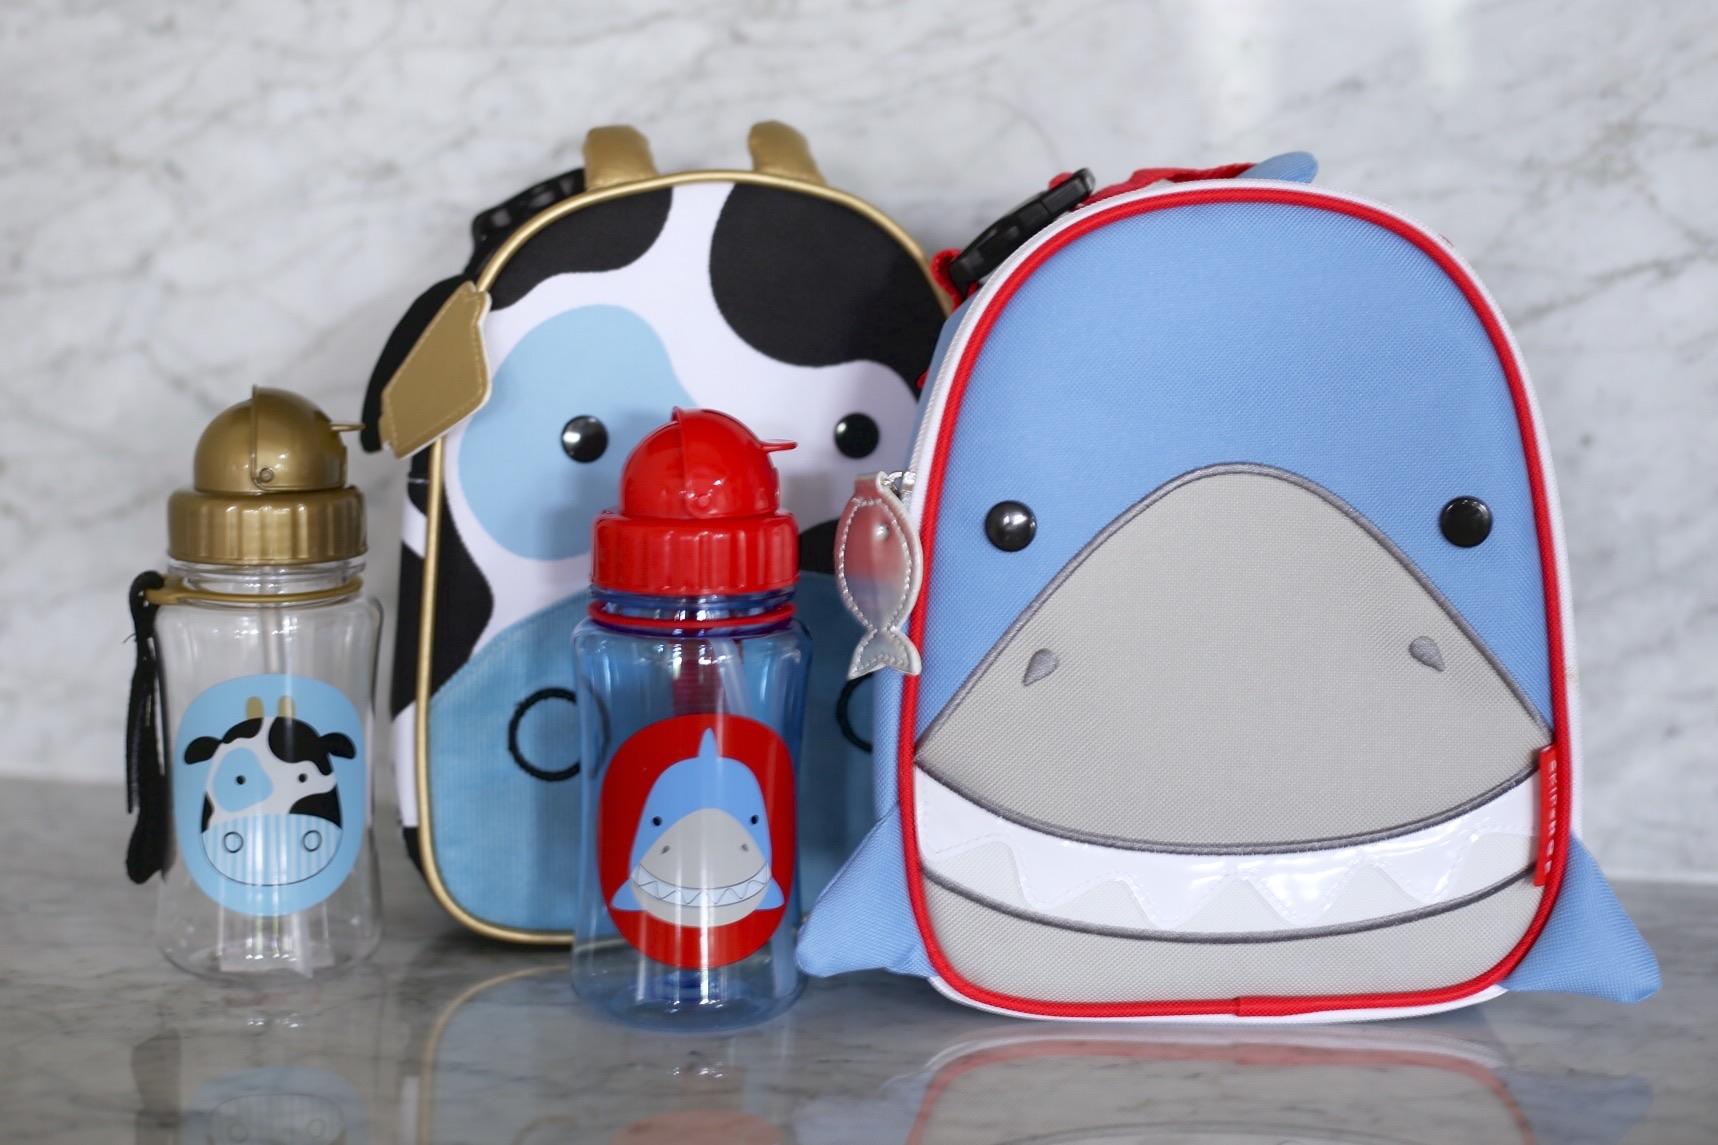 |  cow lunchie  |  cow bottle  |  shark lunchie  |  shark bottle  | image sydney clawson |